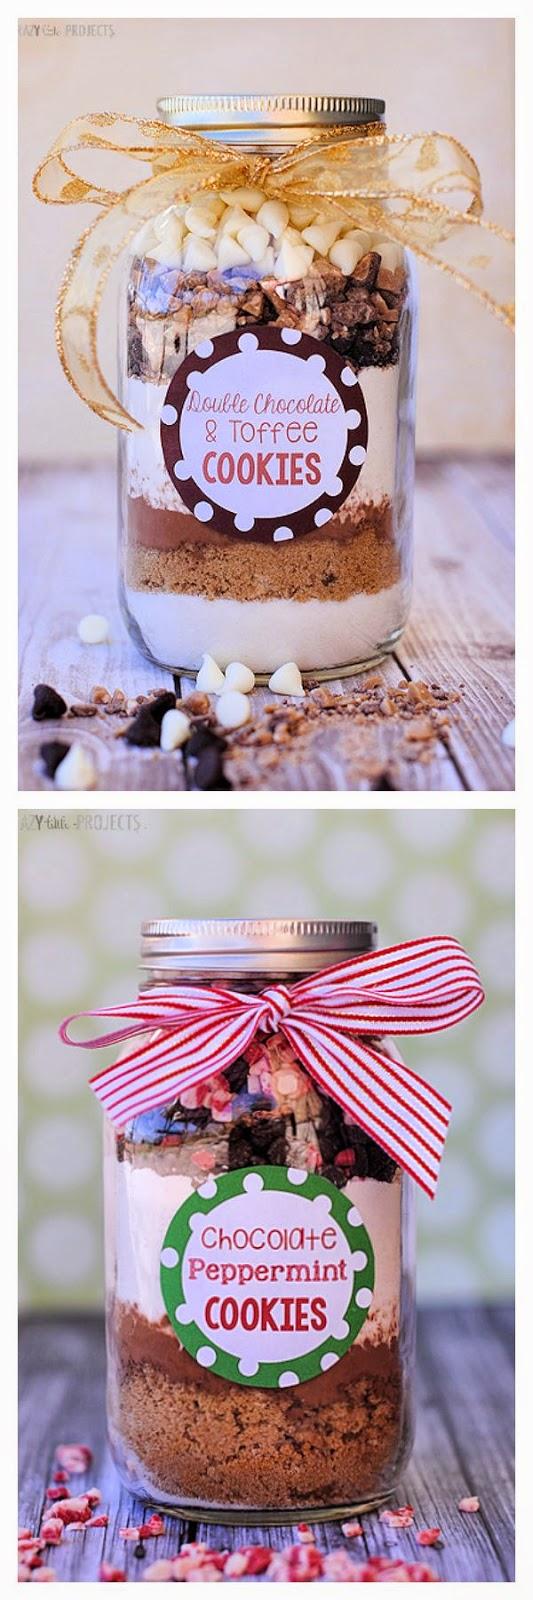 cookies mason jar gift recipes